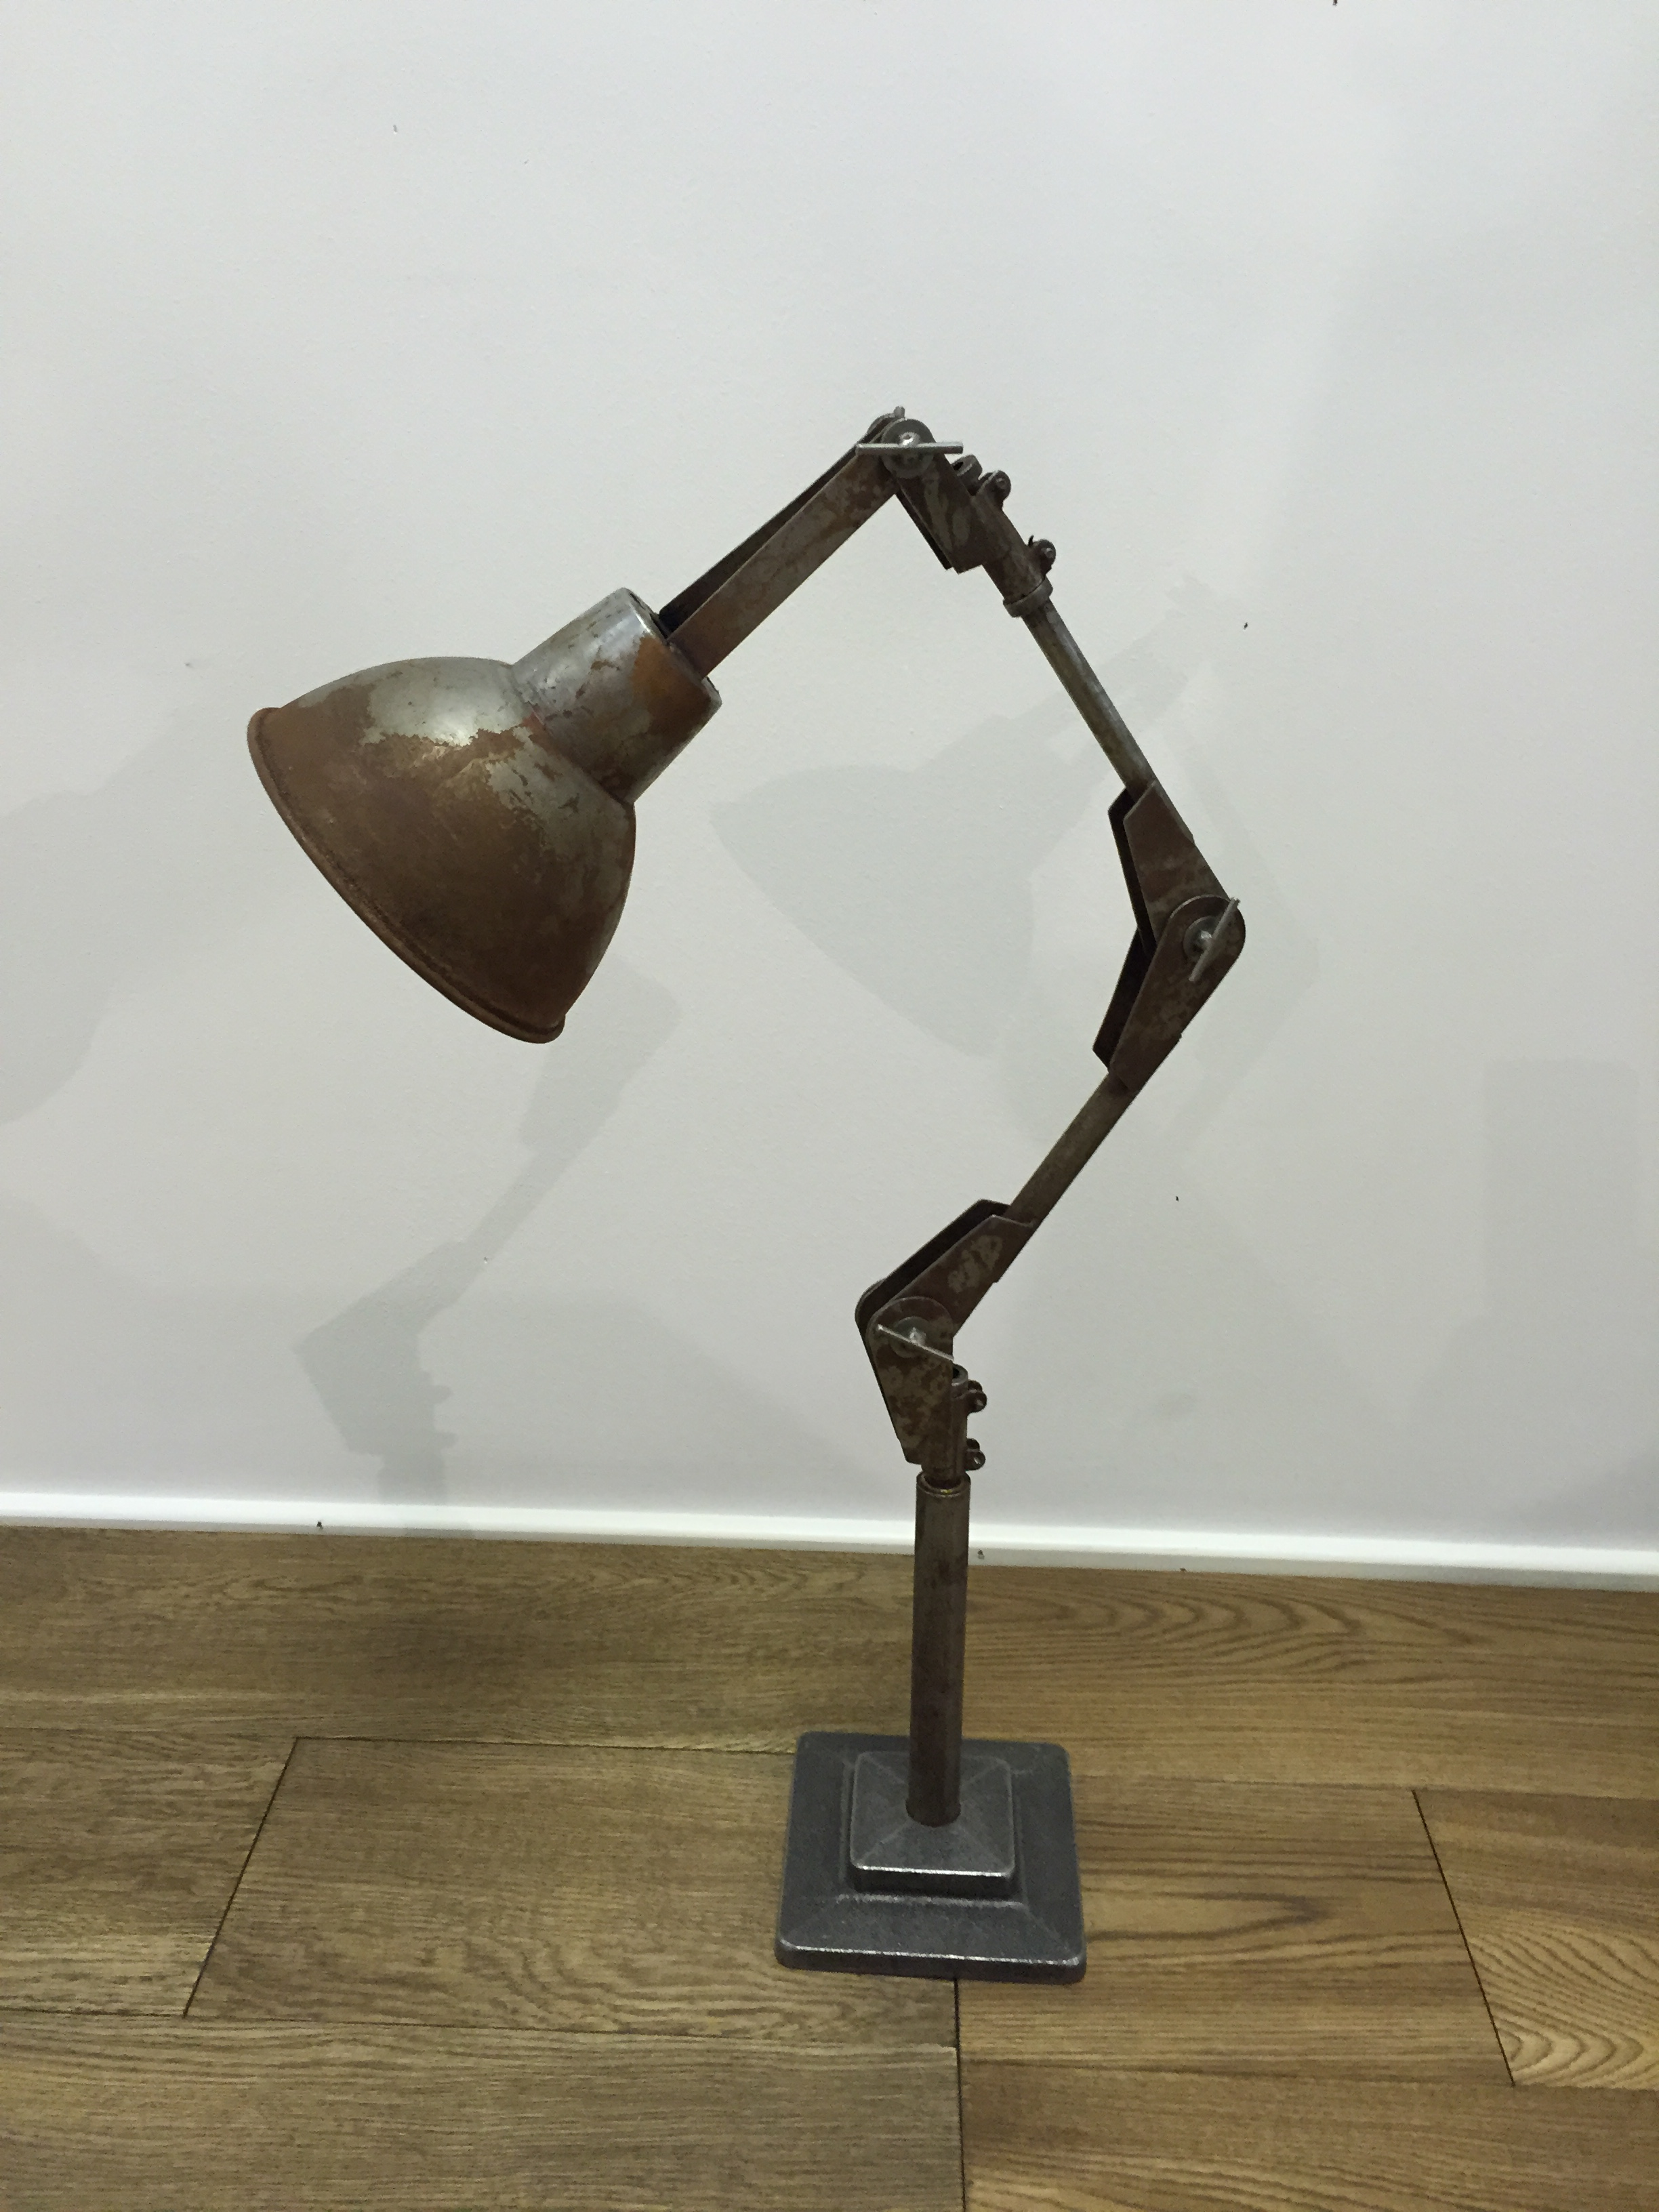 cottingham vintage anglepoise lamp